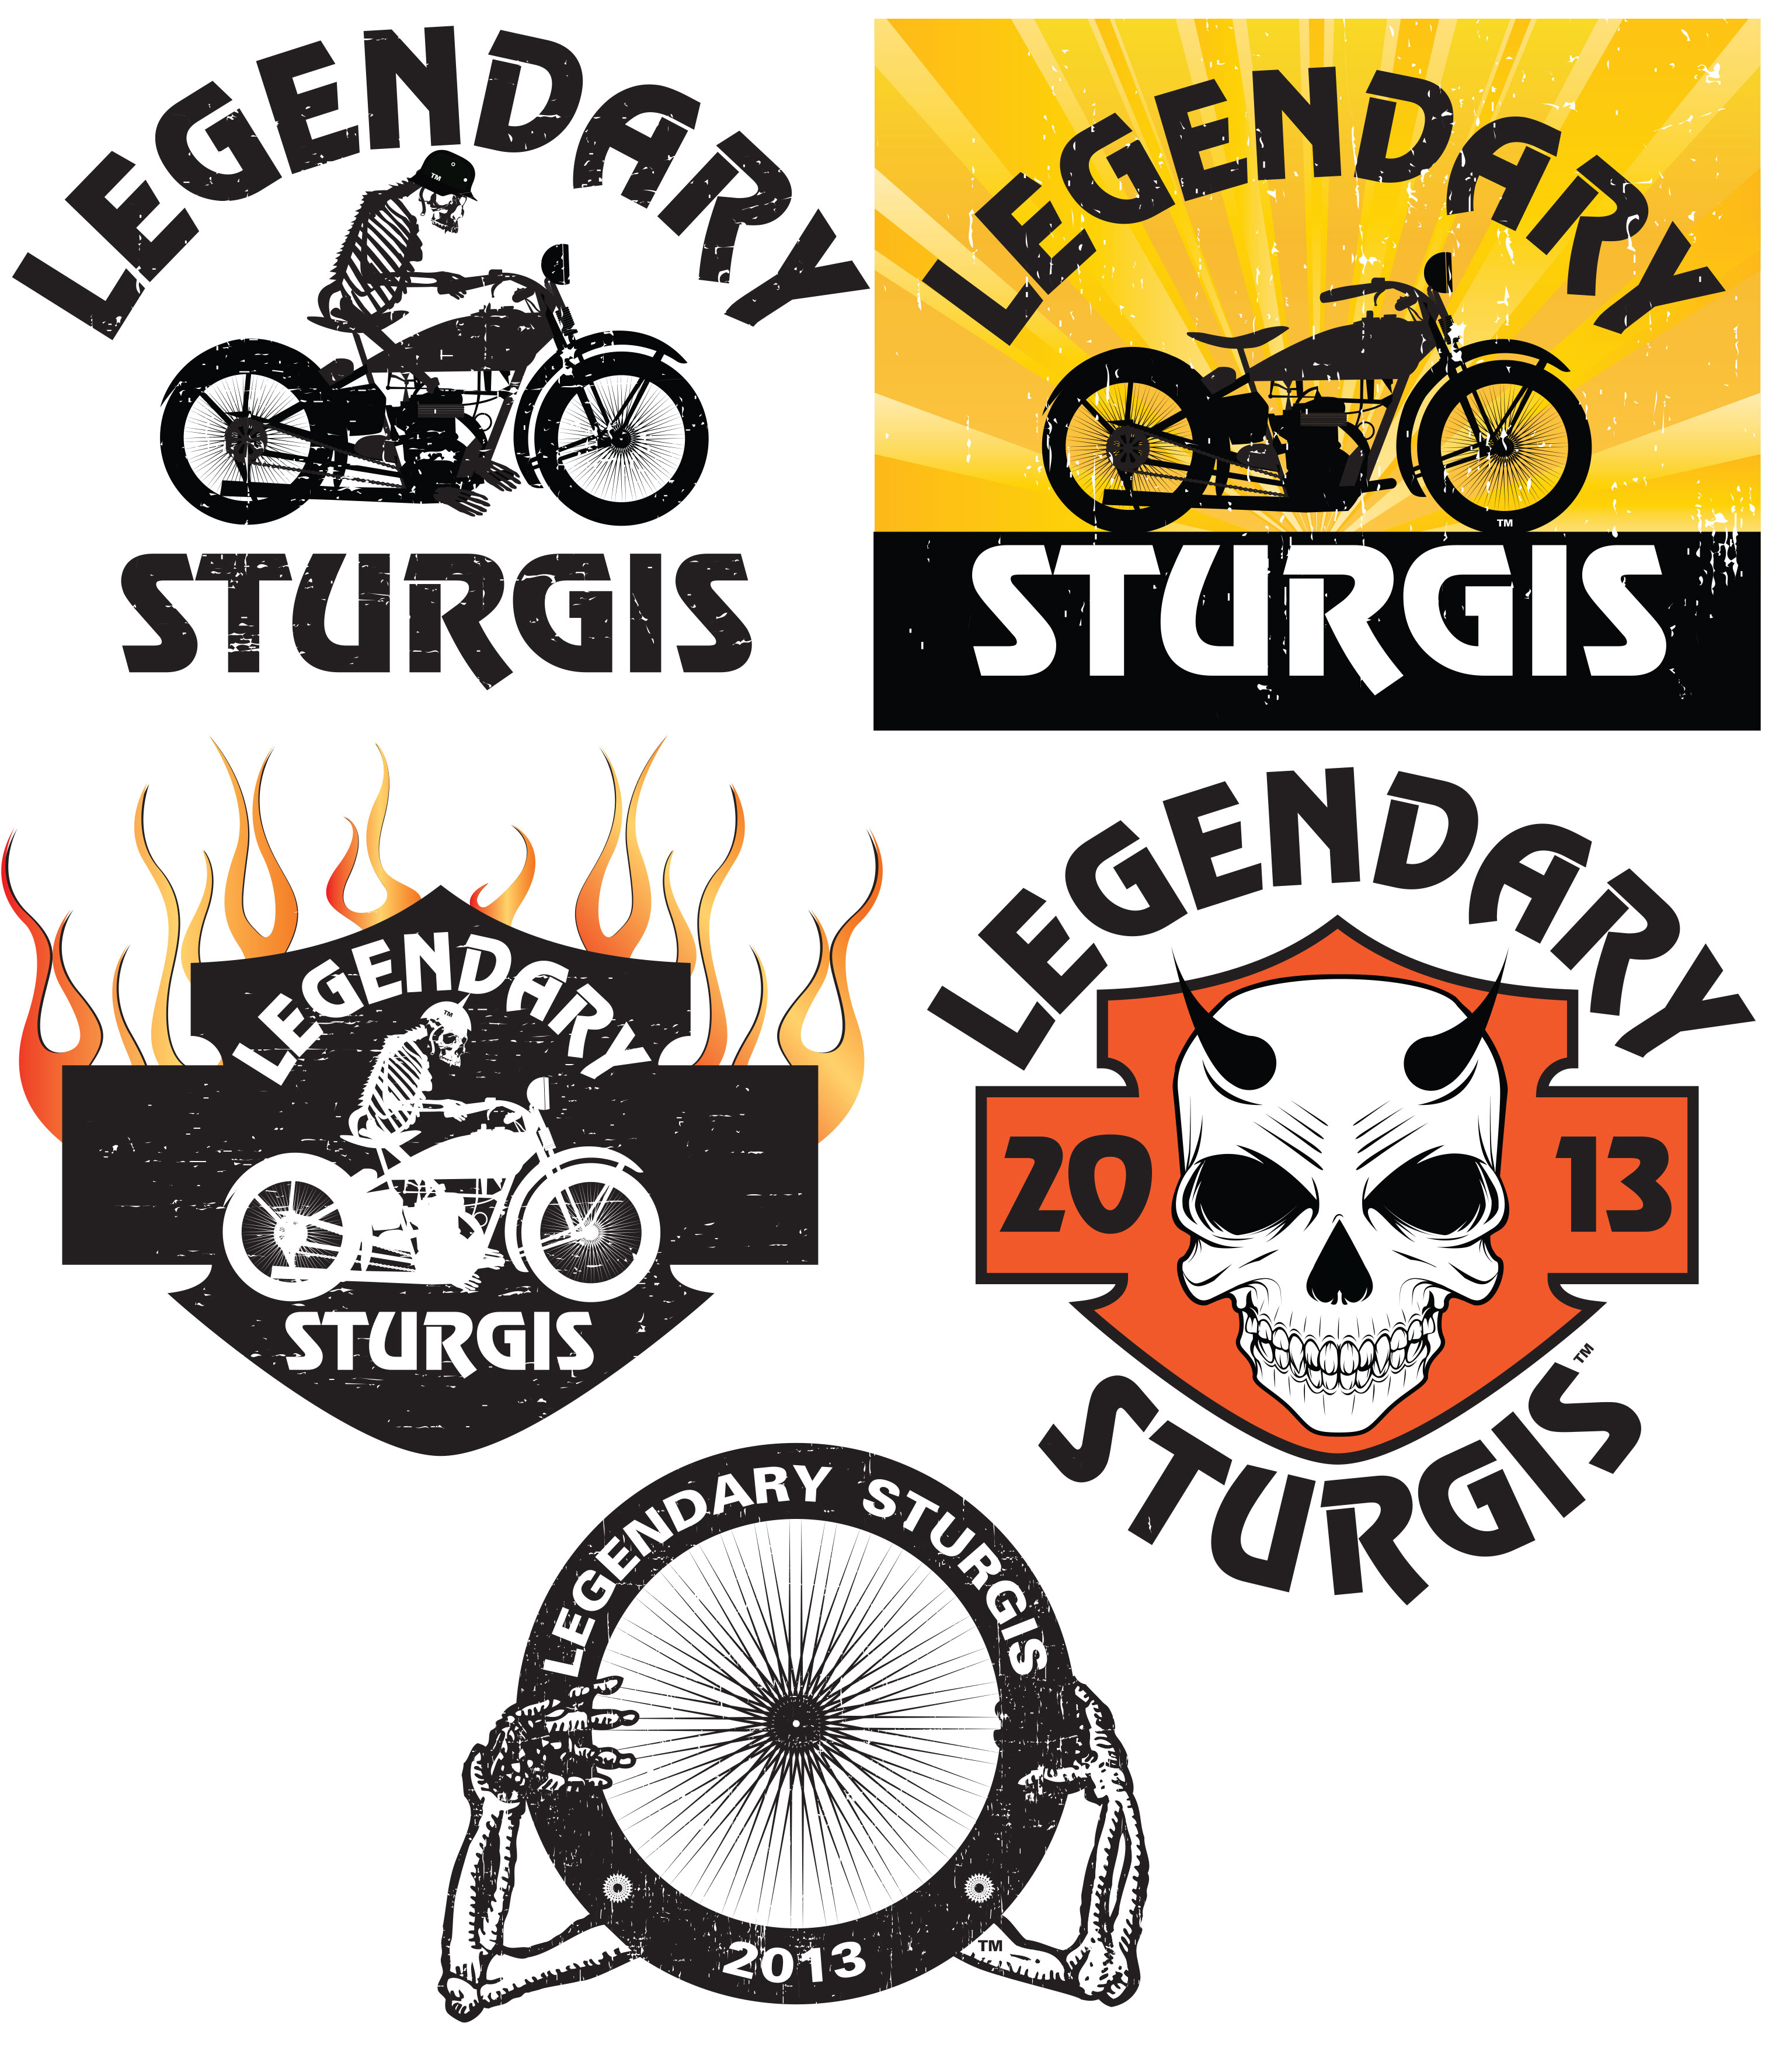 Legendary-Sturgis-Logos-wTM